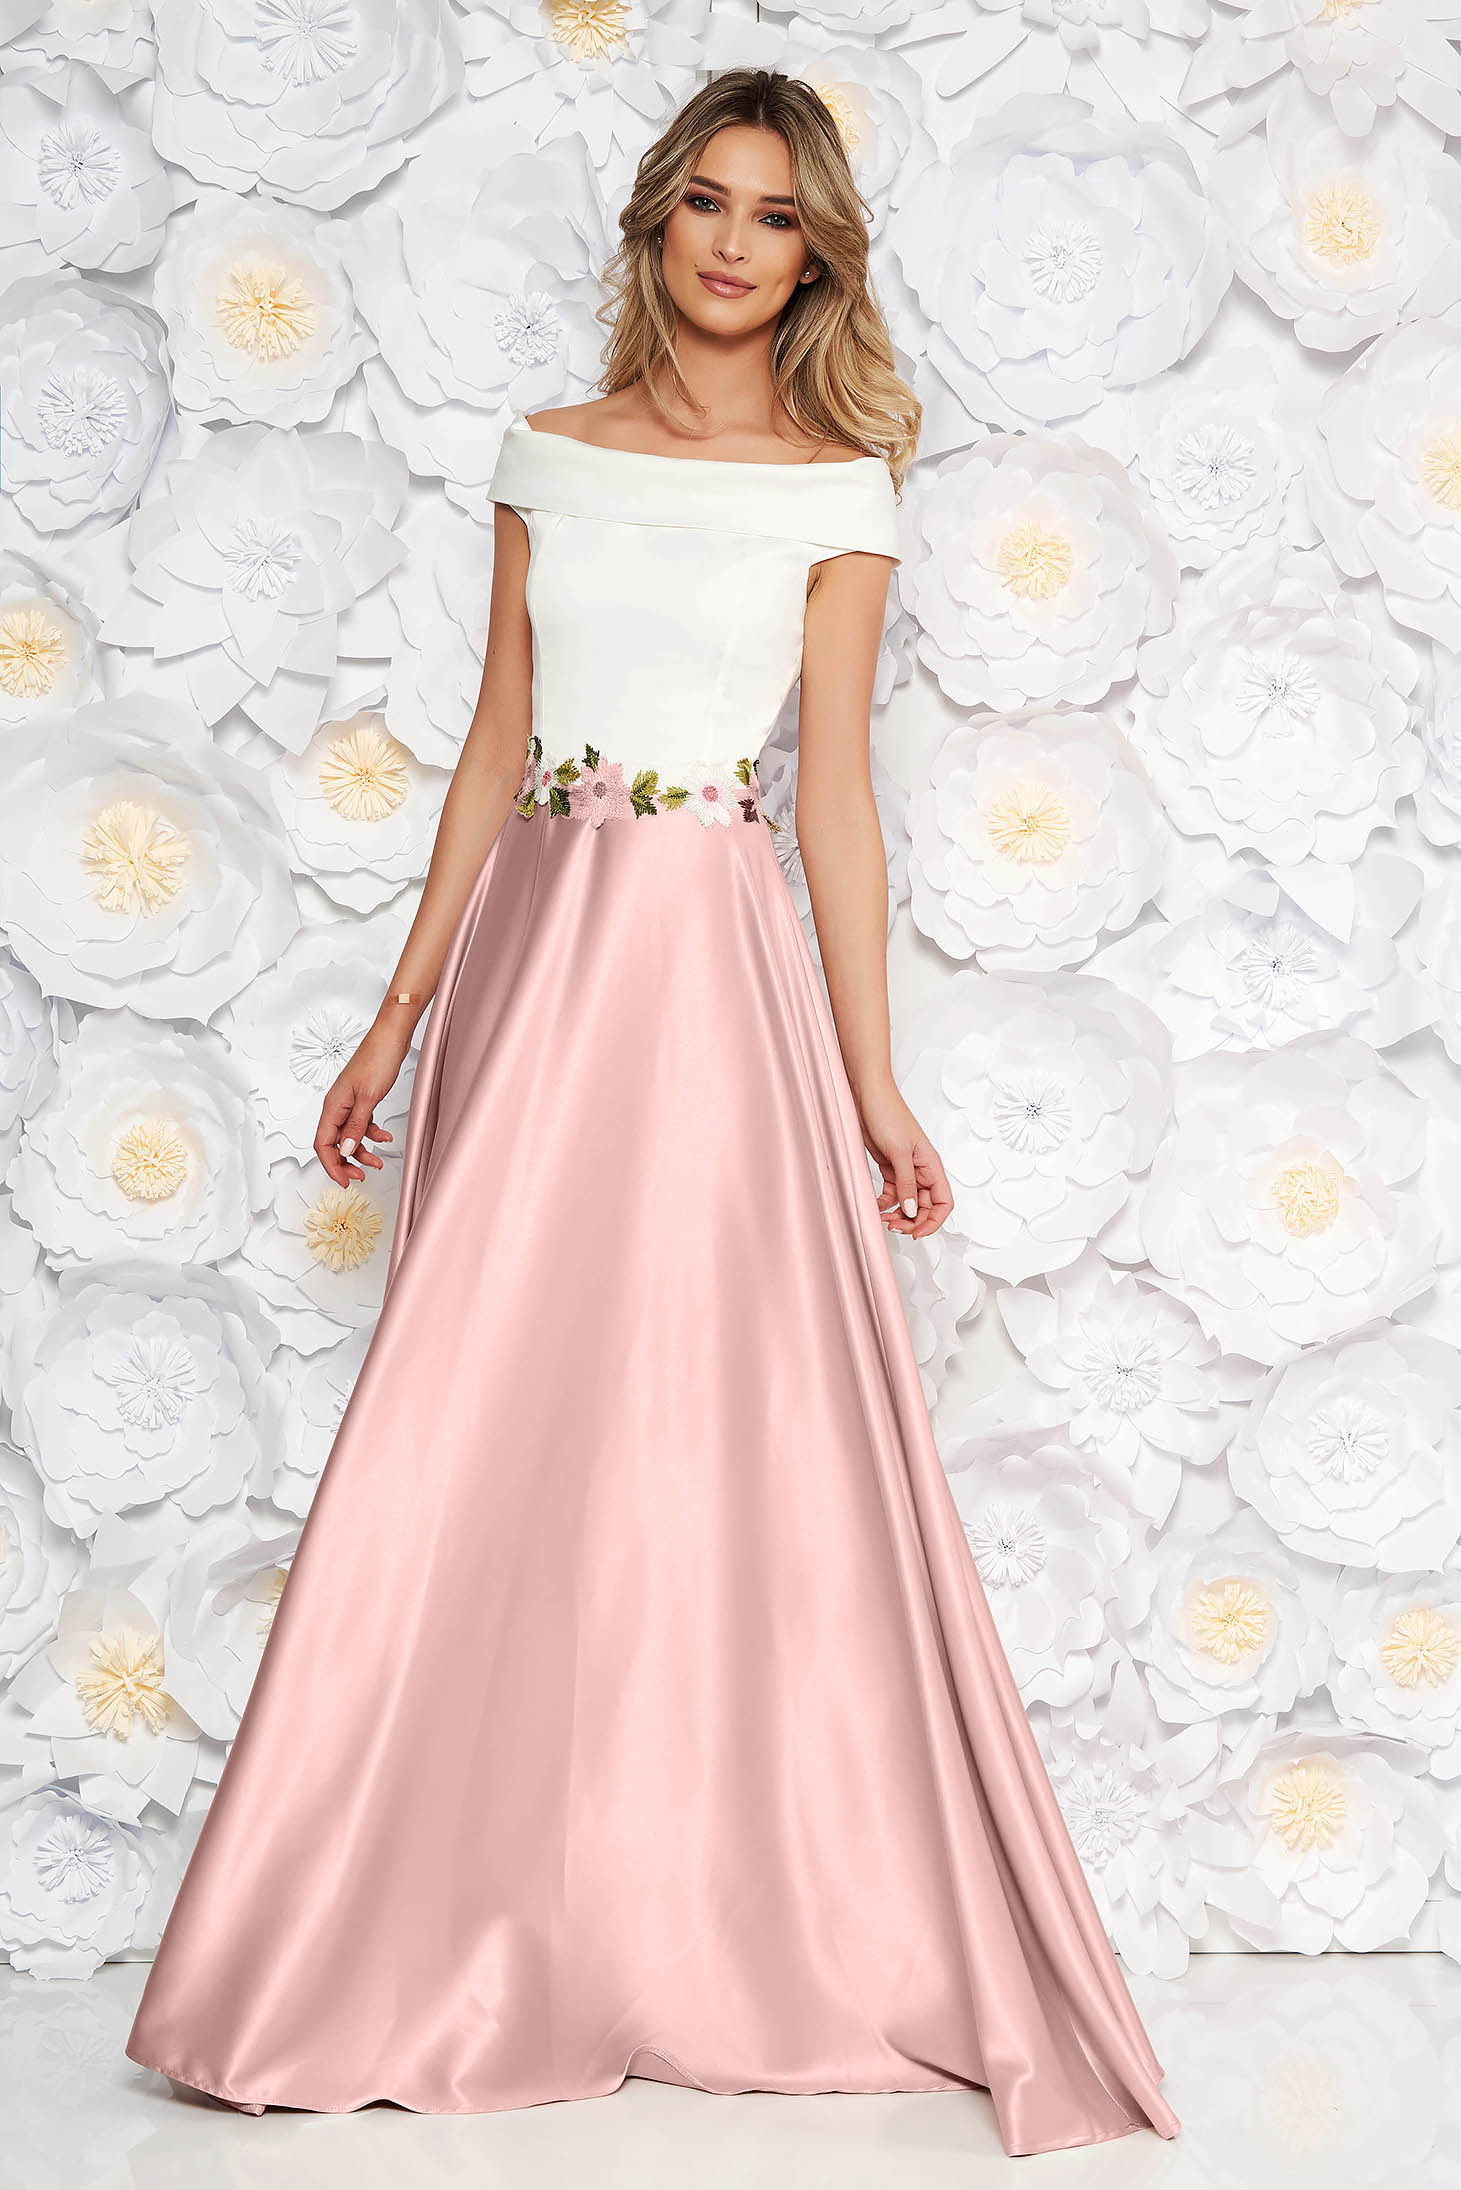 Rochie Artista roz prafuit de ocazie in clos din material satinat cu insertii de broderie